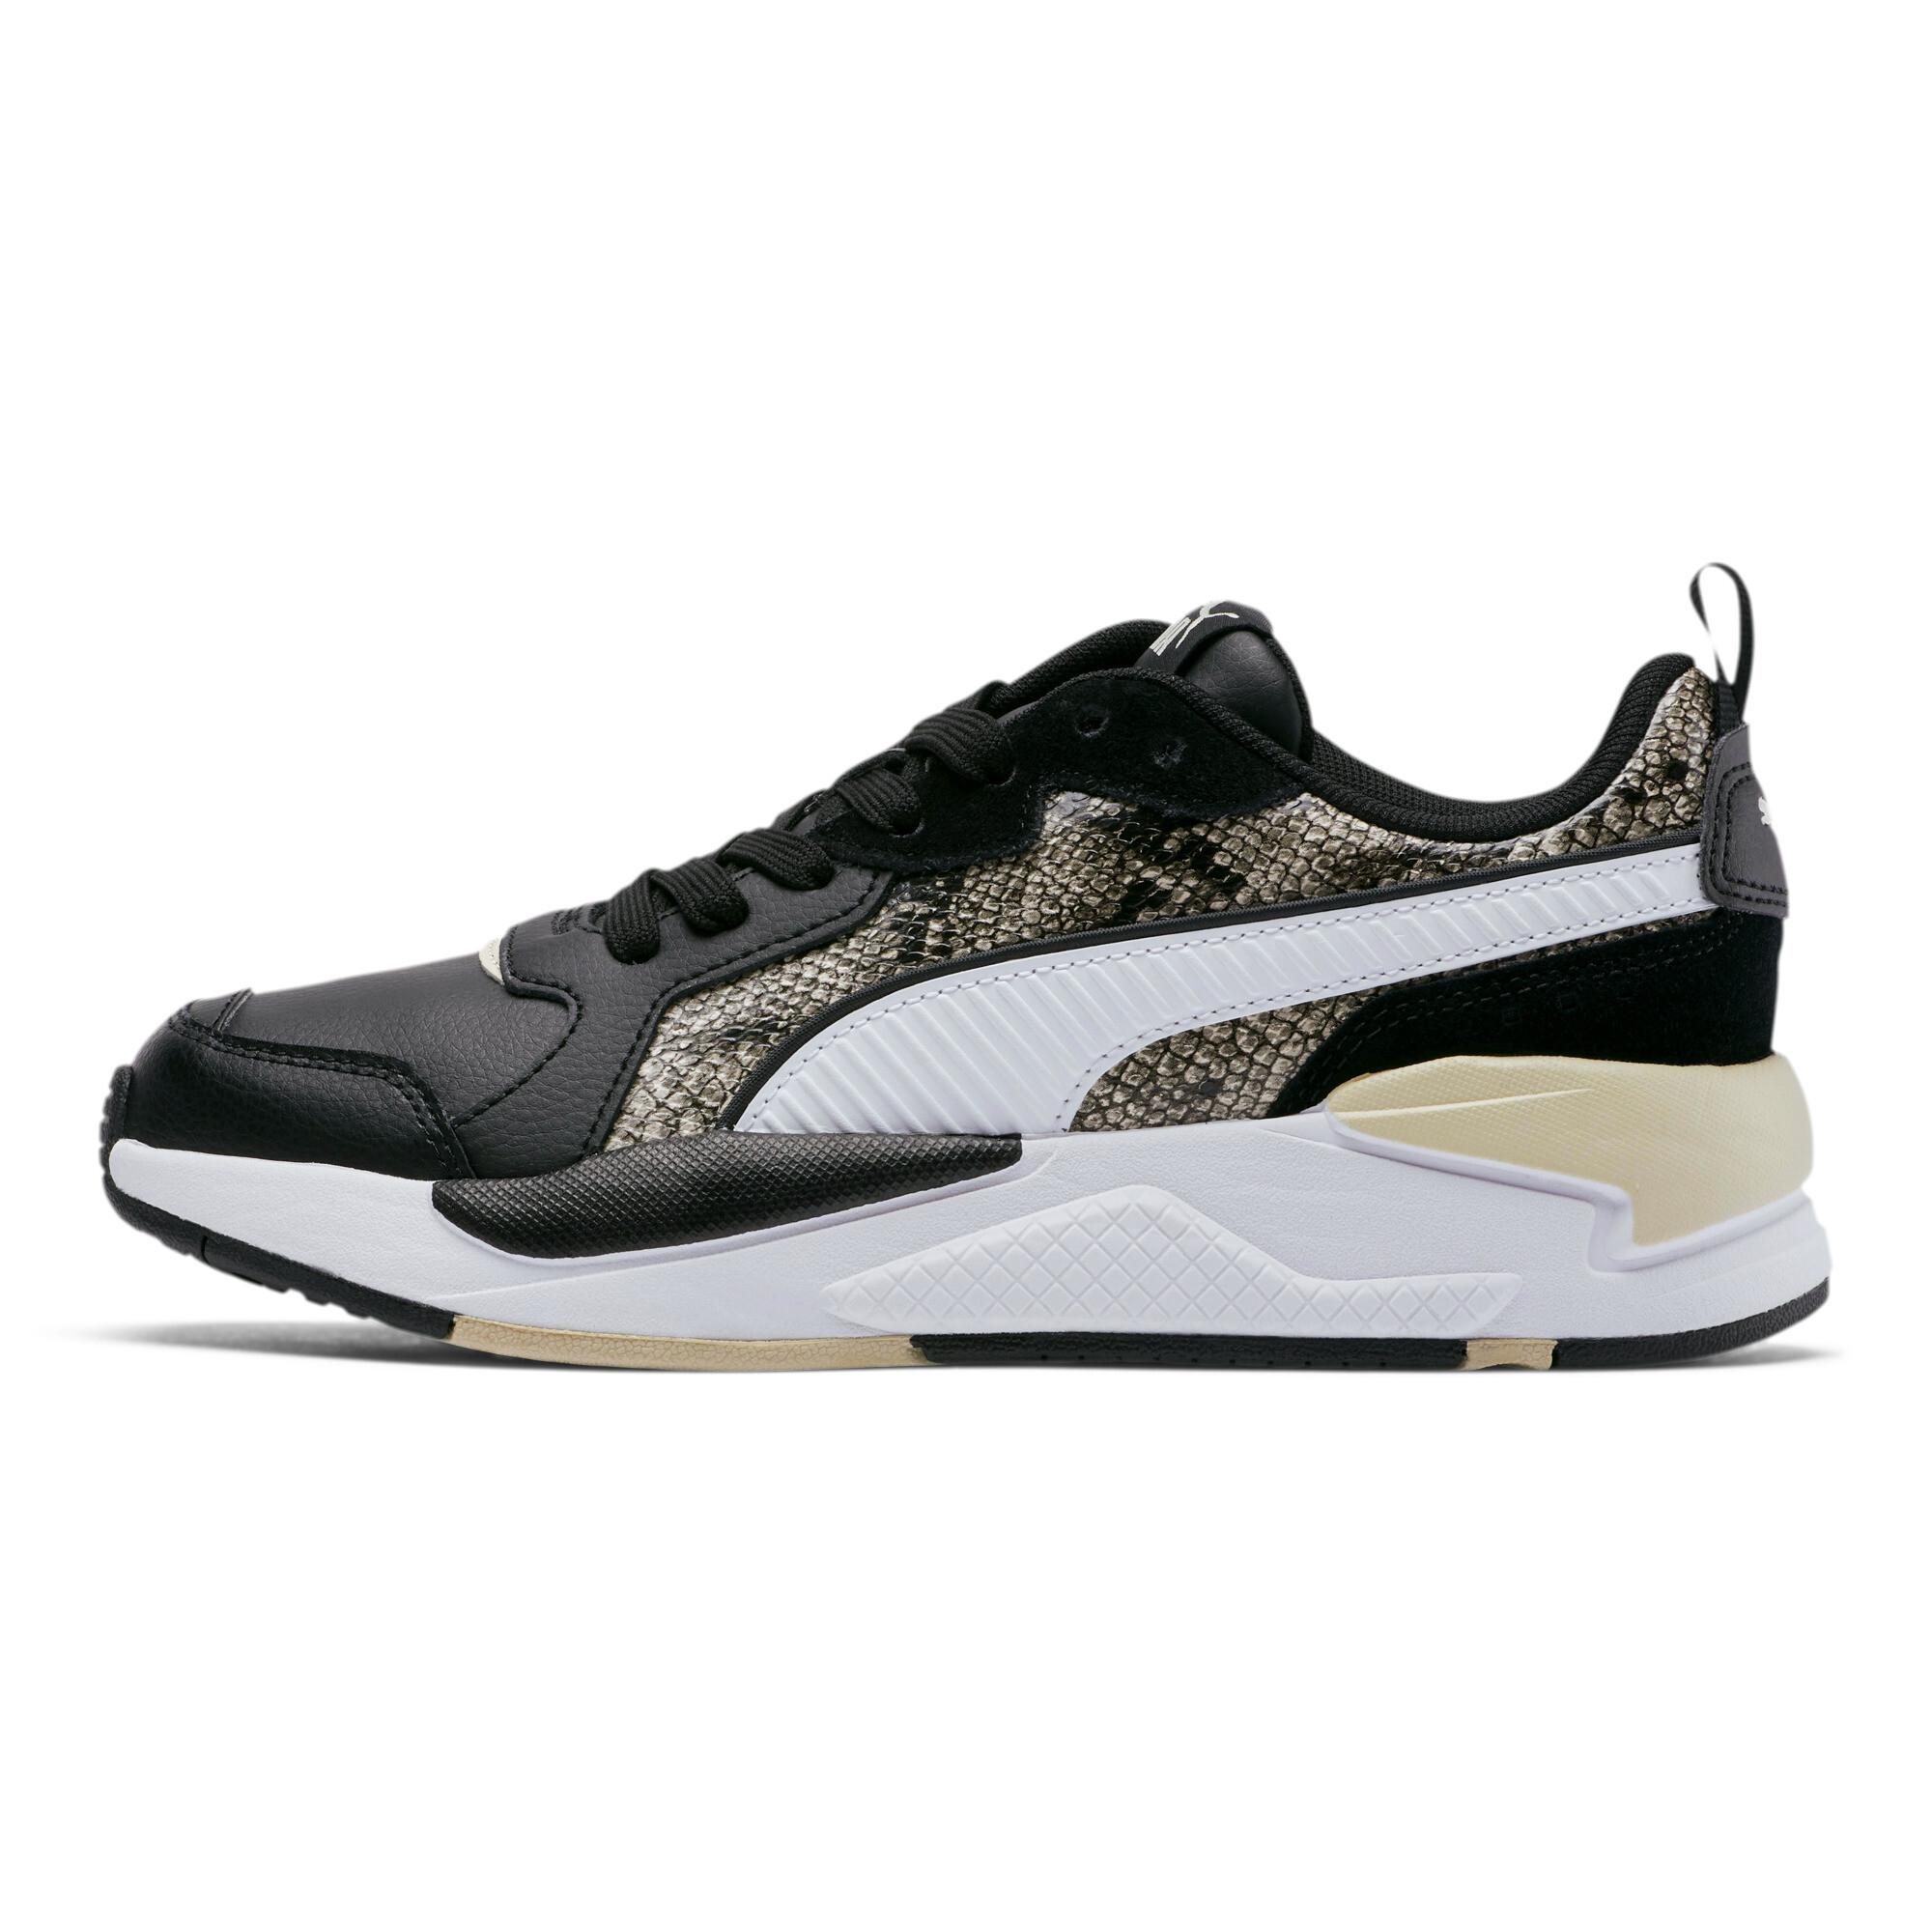 PUMA-Women-039-s-X-RAY-Reptile-Sneakers thumbnail 4